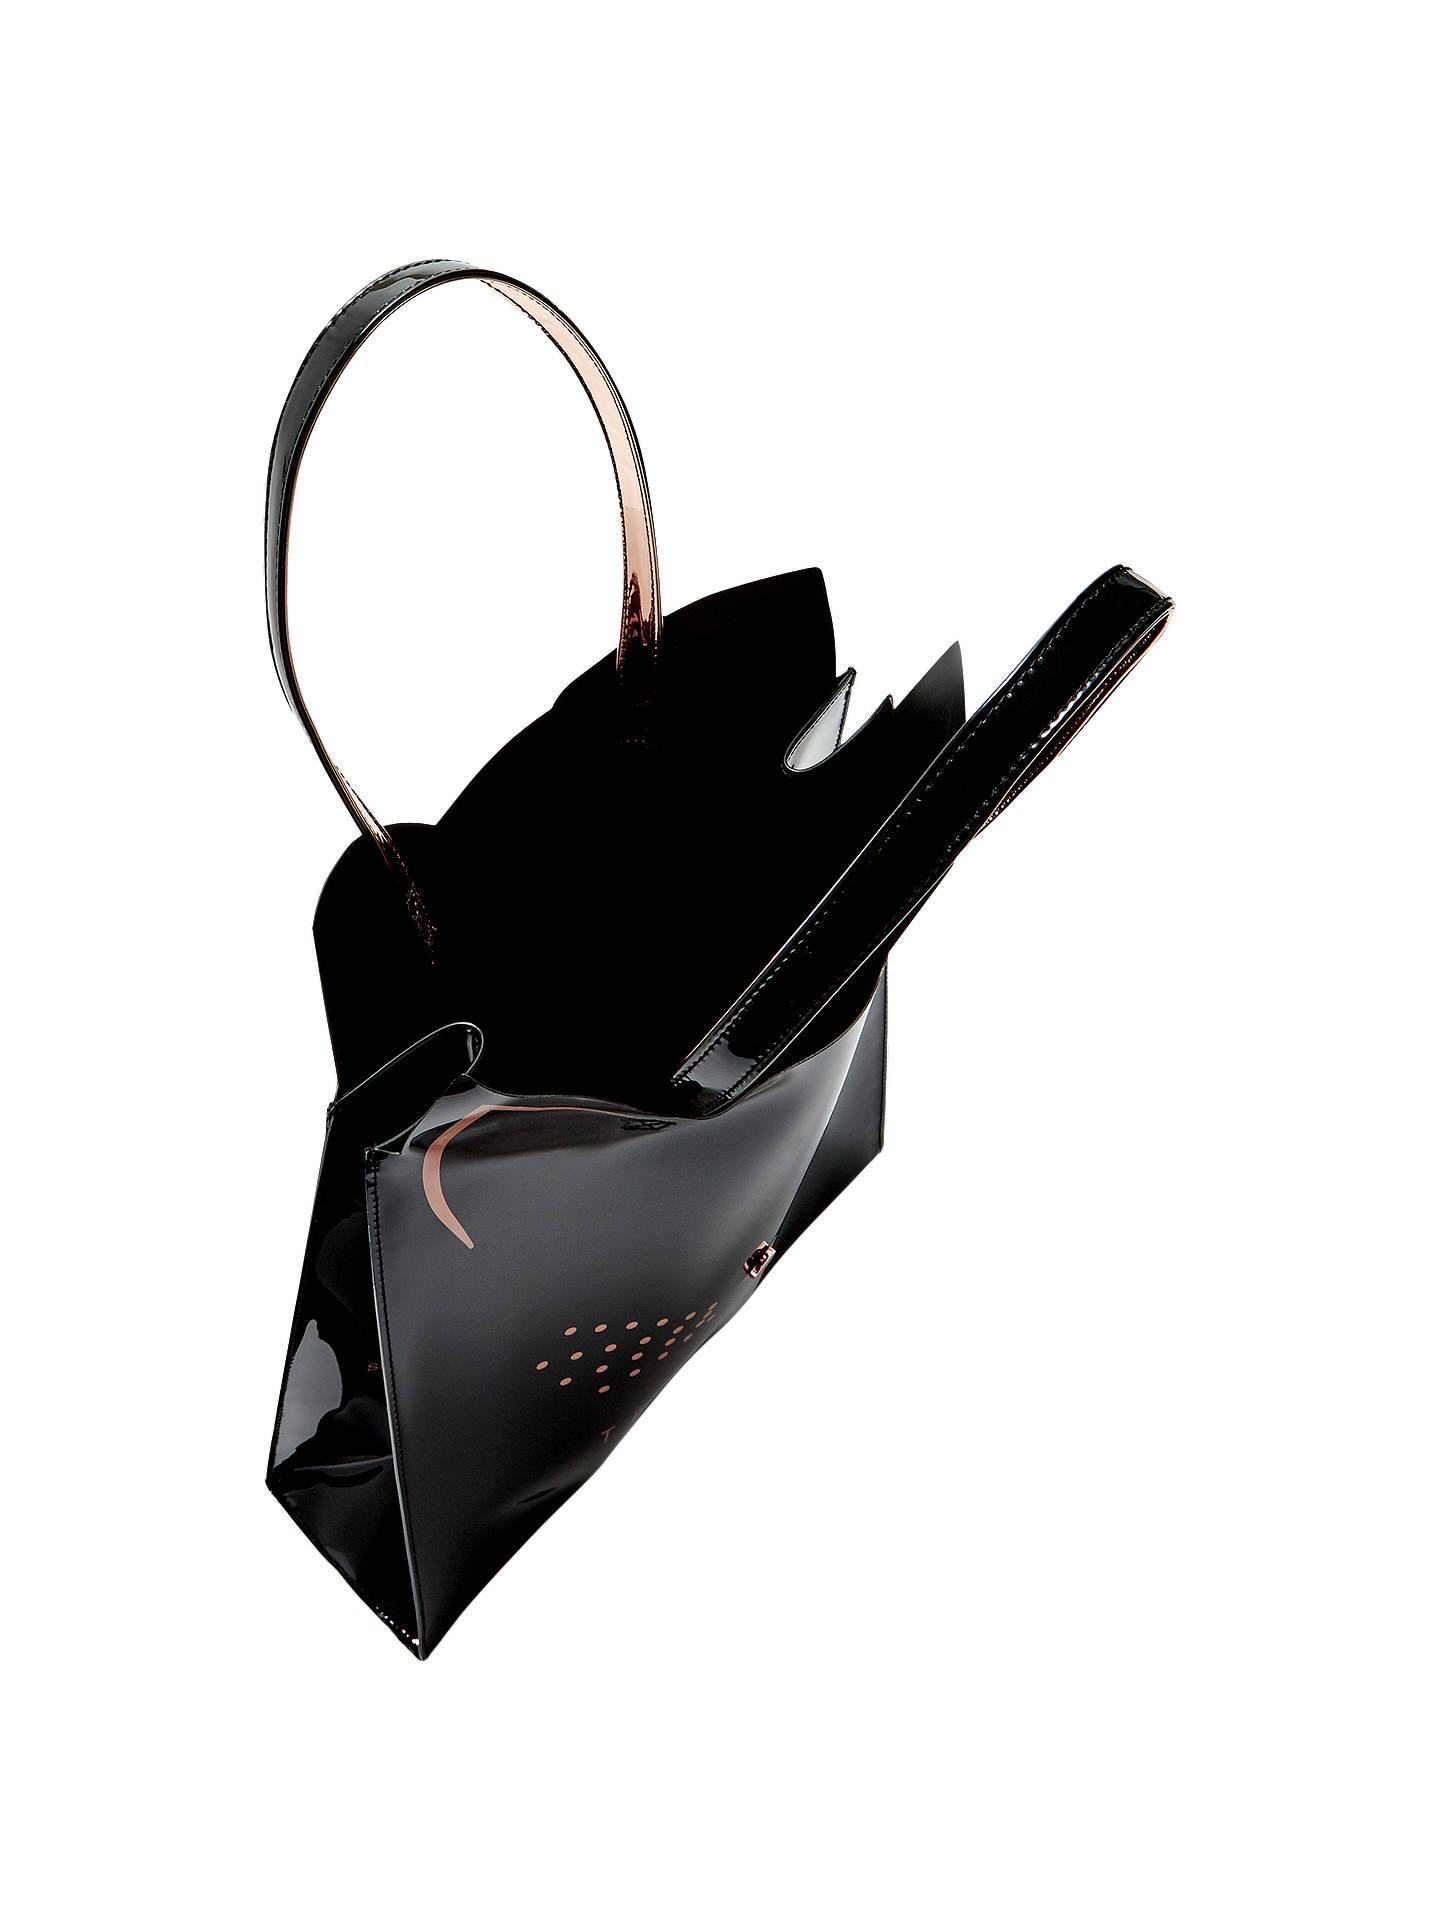 0a3329149d ... Buy Ted Baker Felicon Cat Large Icon Shopper Bag, Black Online at  johnlewis.com ...